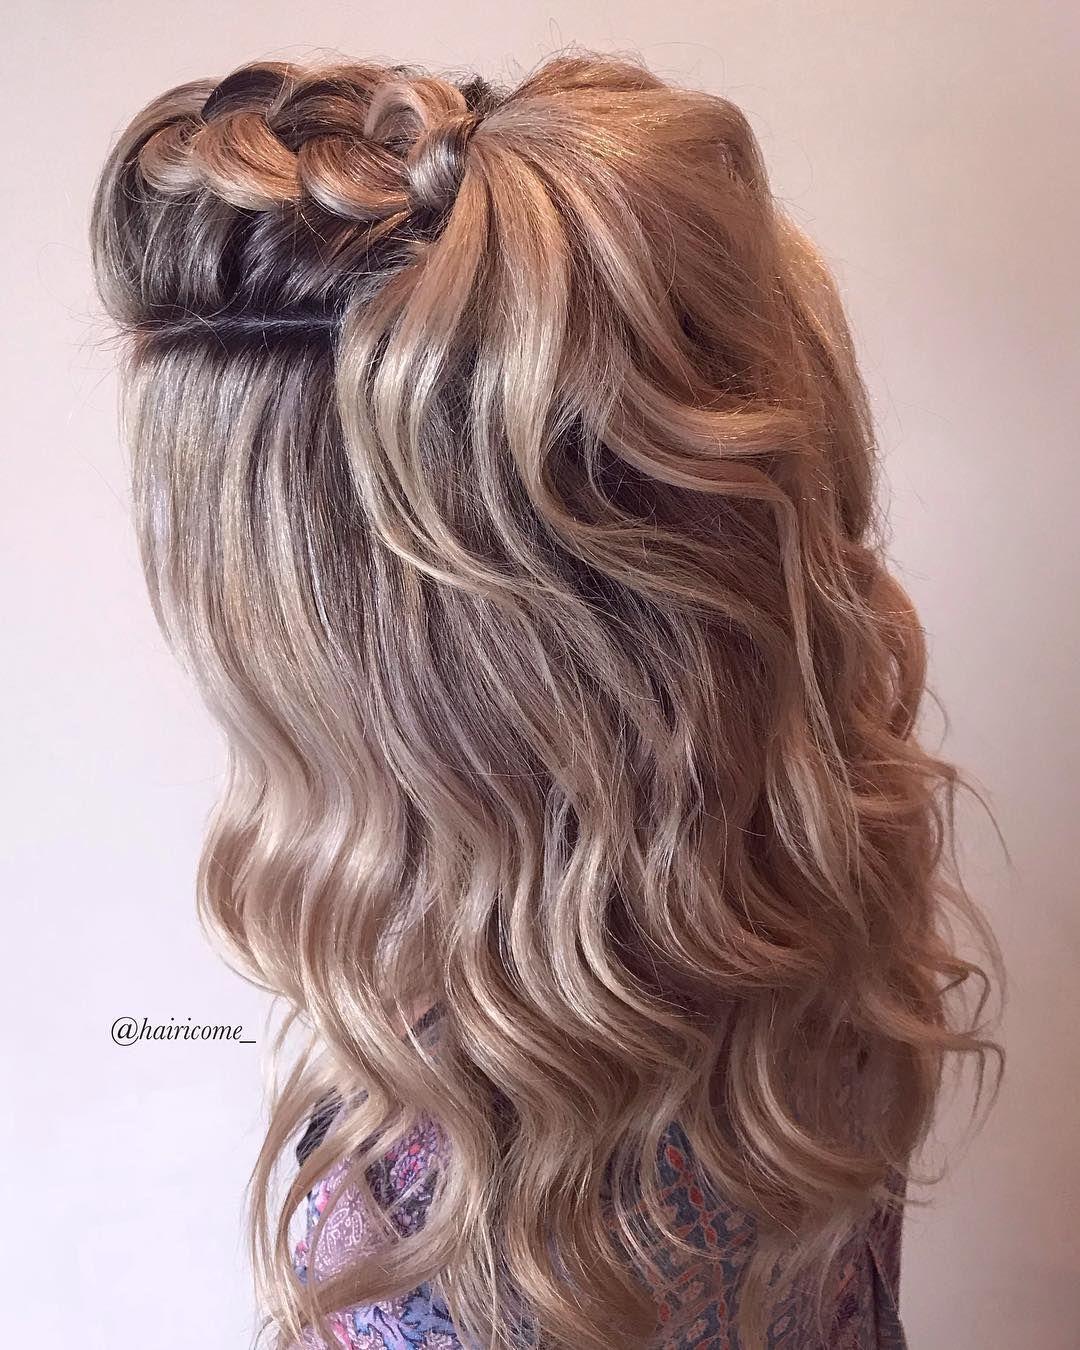 Pull through braid , braid hairstyle ,bridal updo ,updo hairstyles #hair #hairstyle #braids #weddinghair #updo